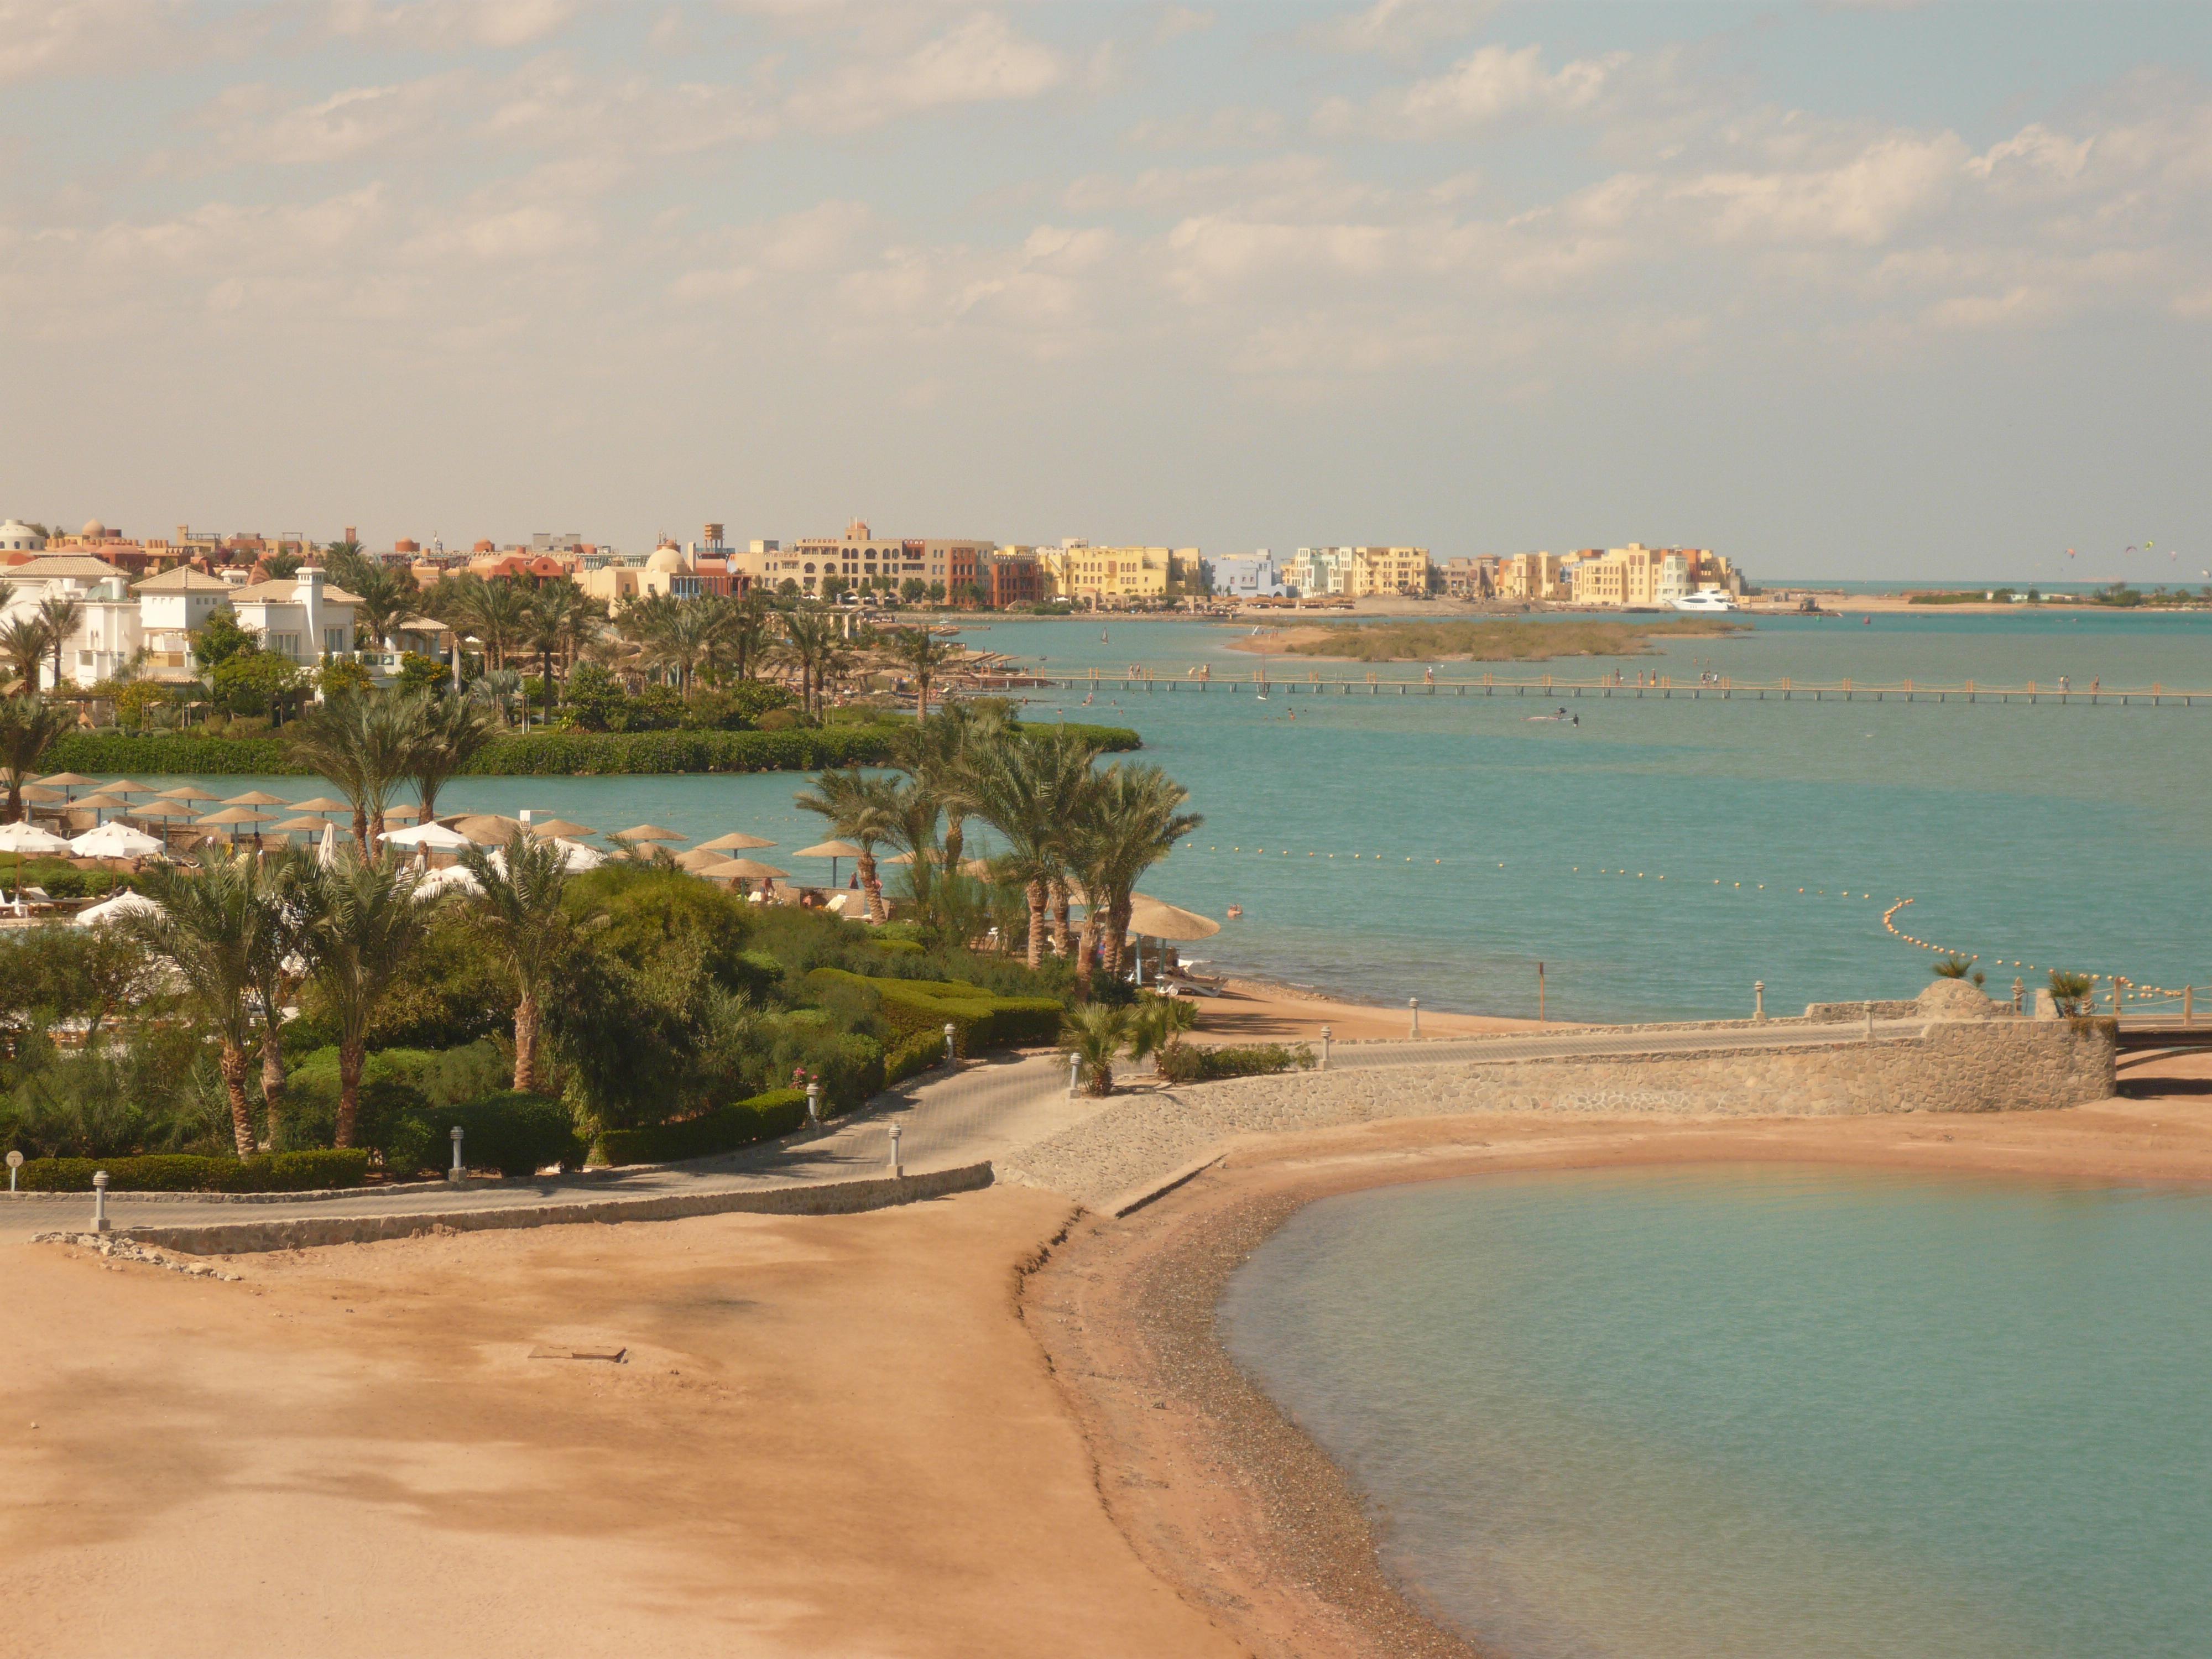 File:El Gouna, Qesm Hurghada, Red Sea Governorate, Egypt - p